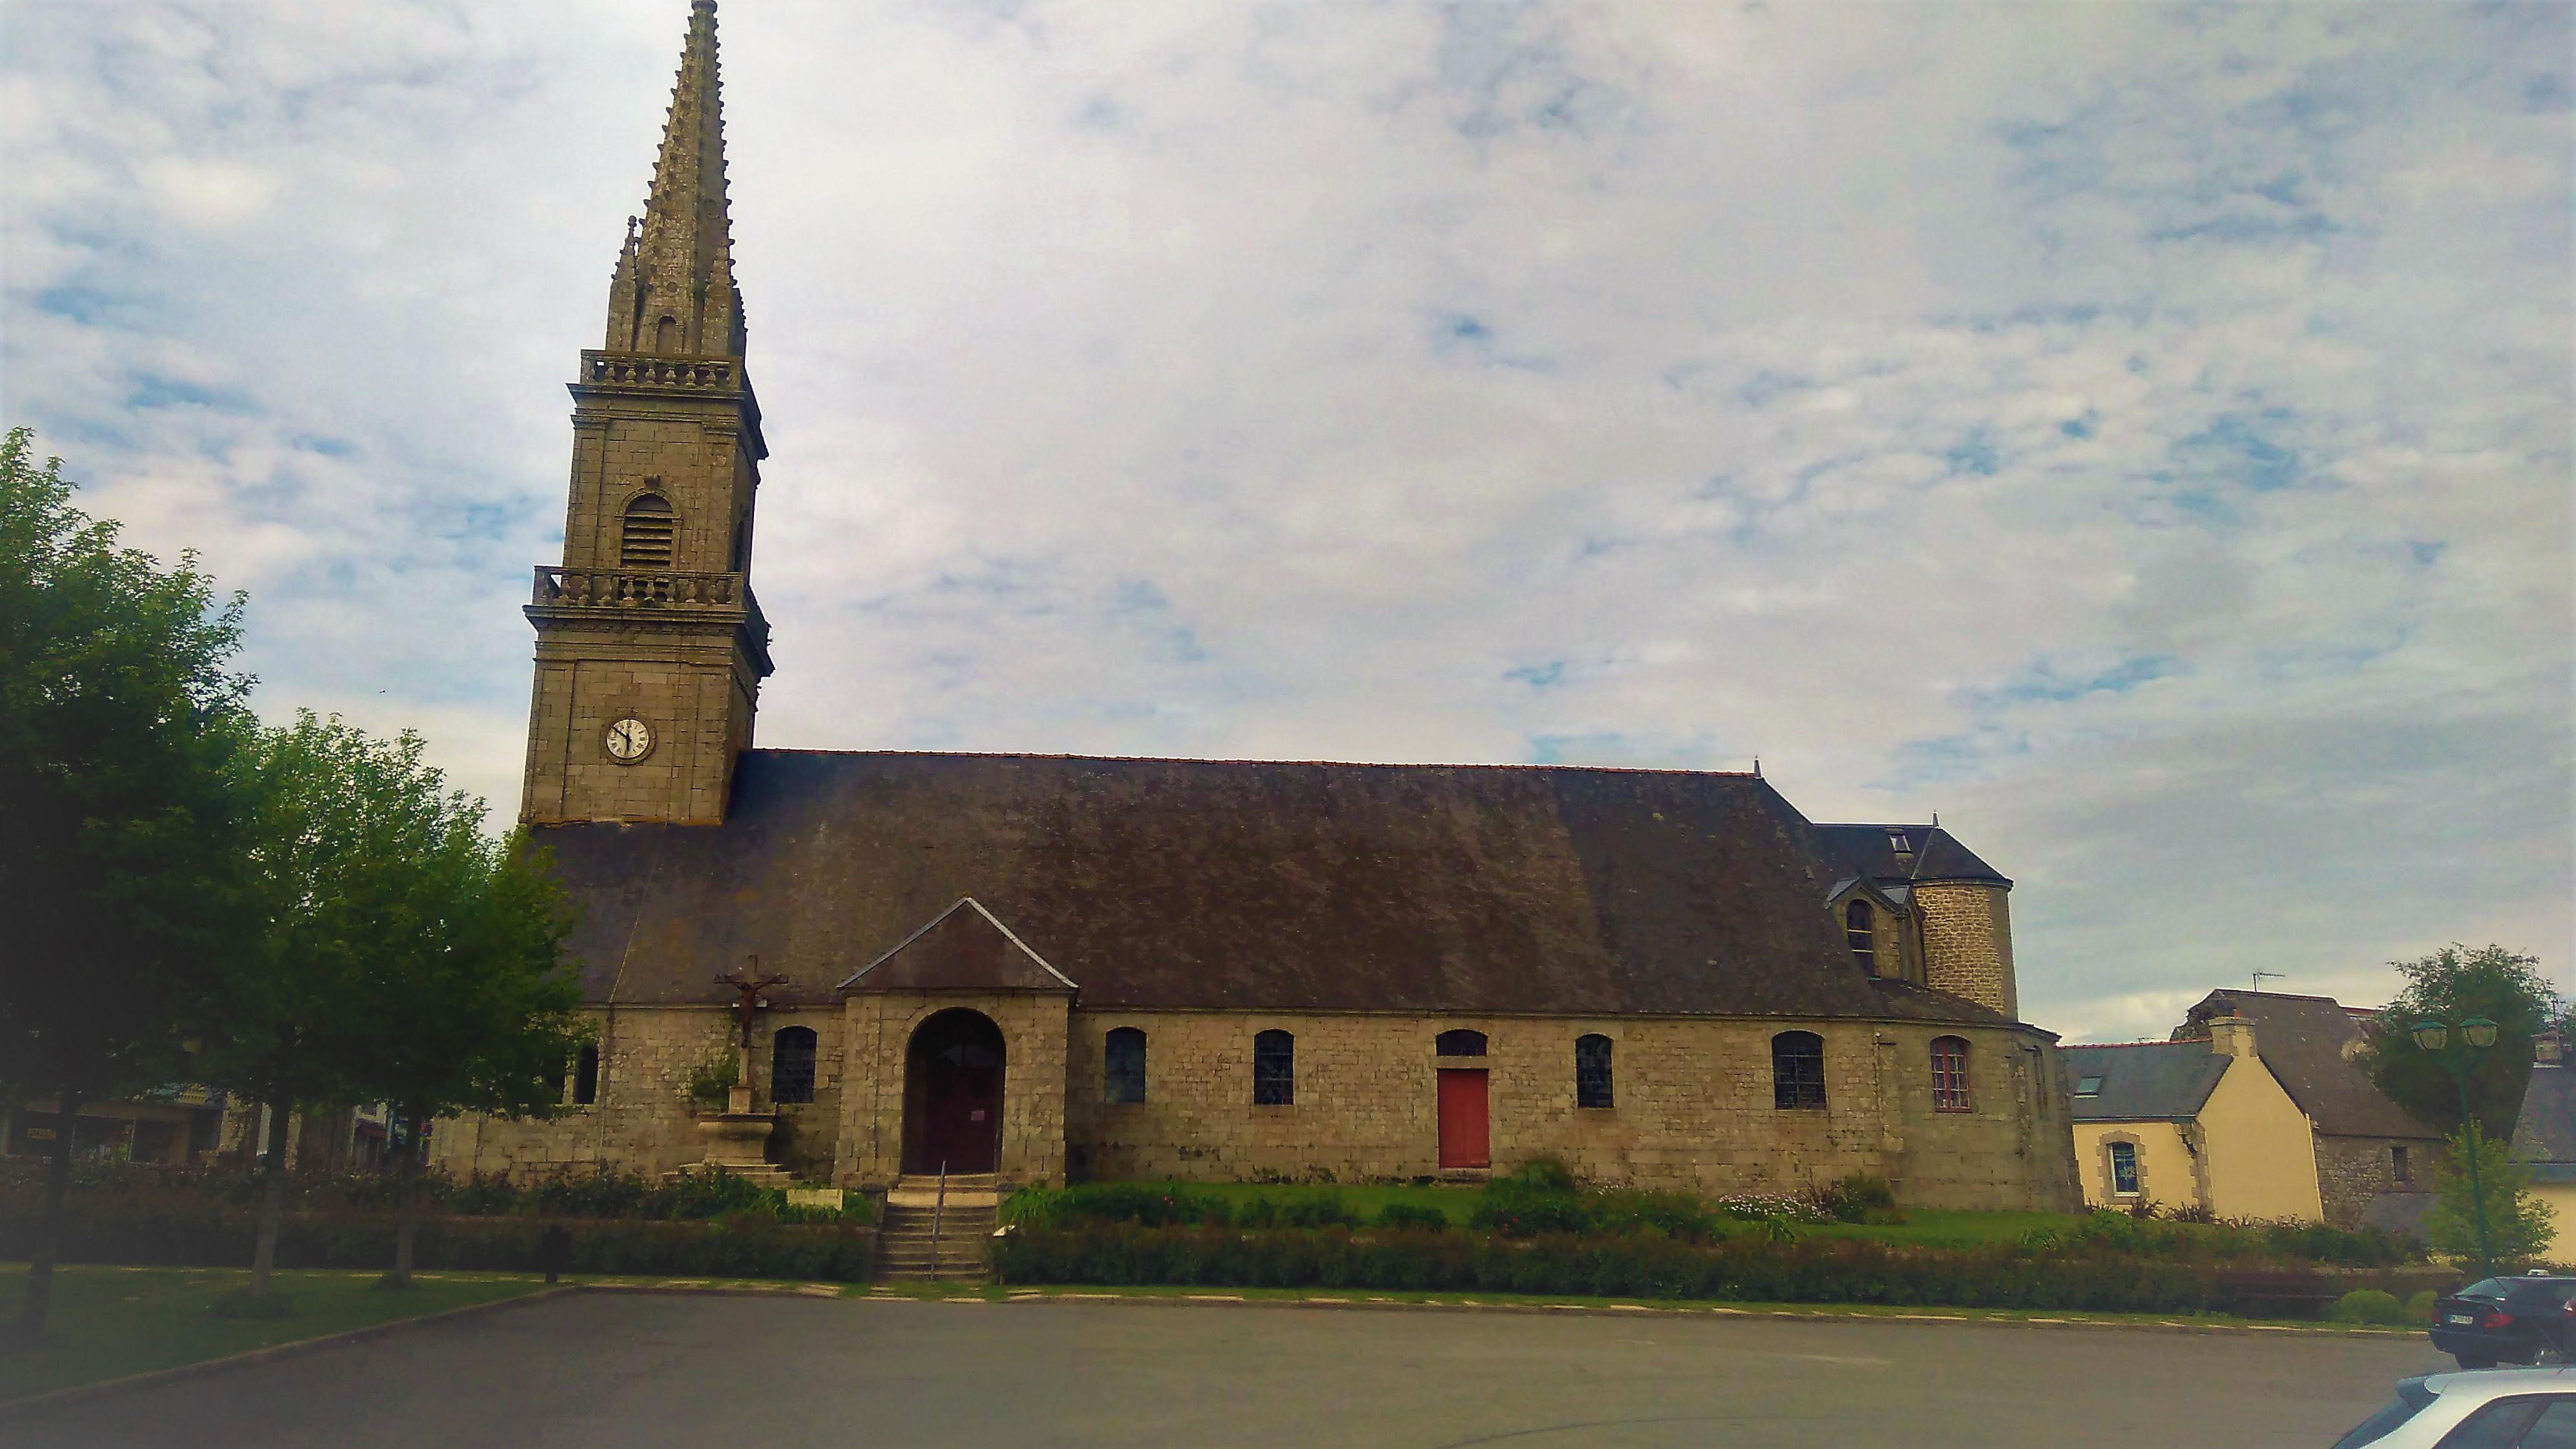 Eglise St Alban